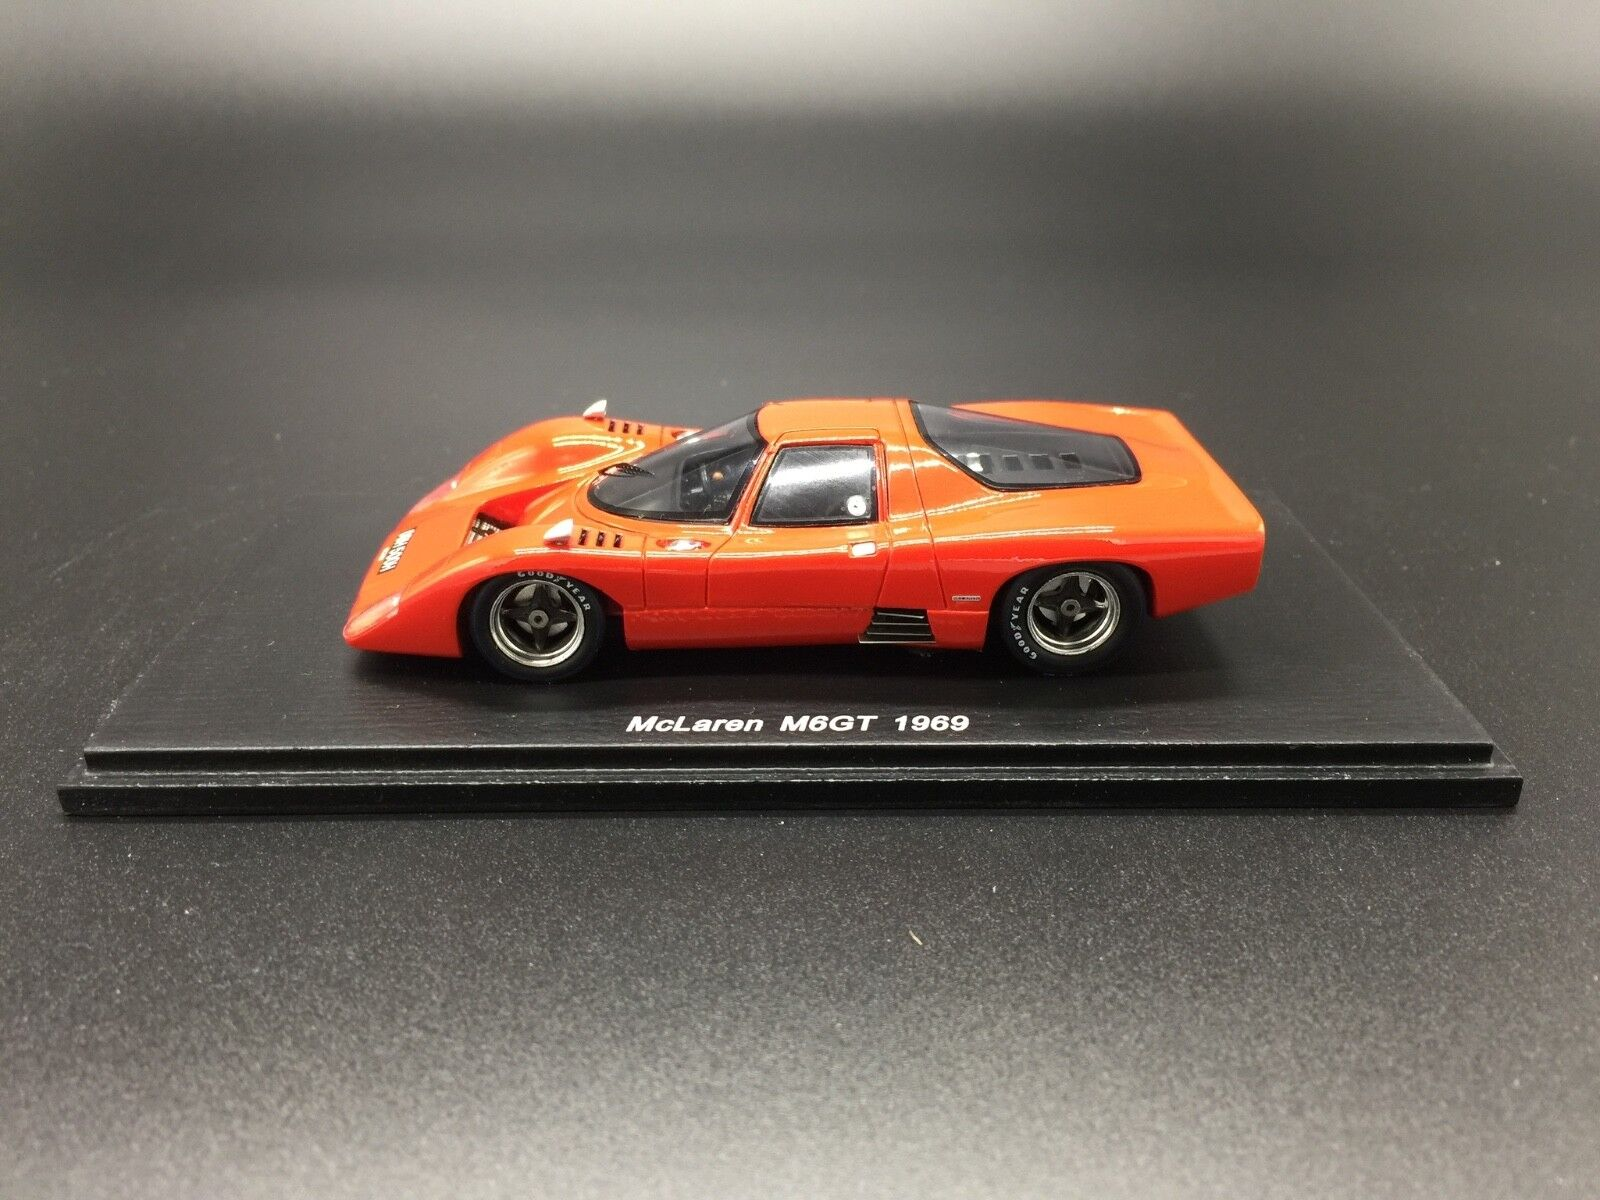 Spark S3113 McLaren M6GT 1969 - 1 43 Scale